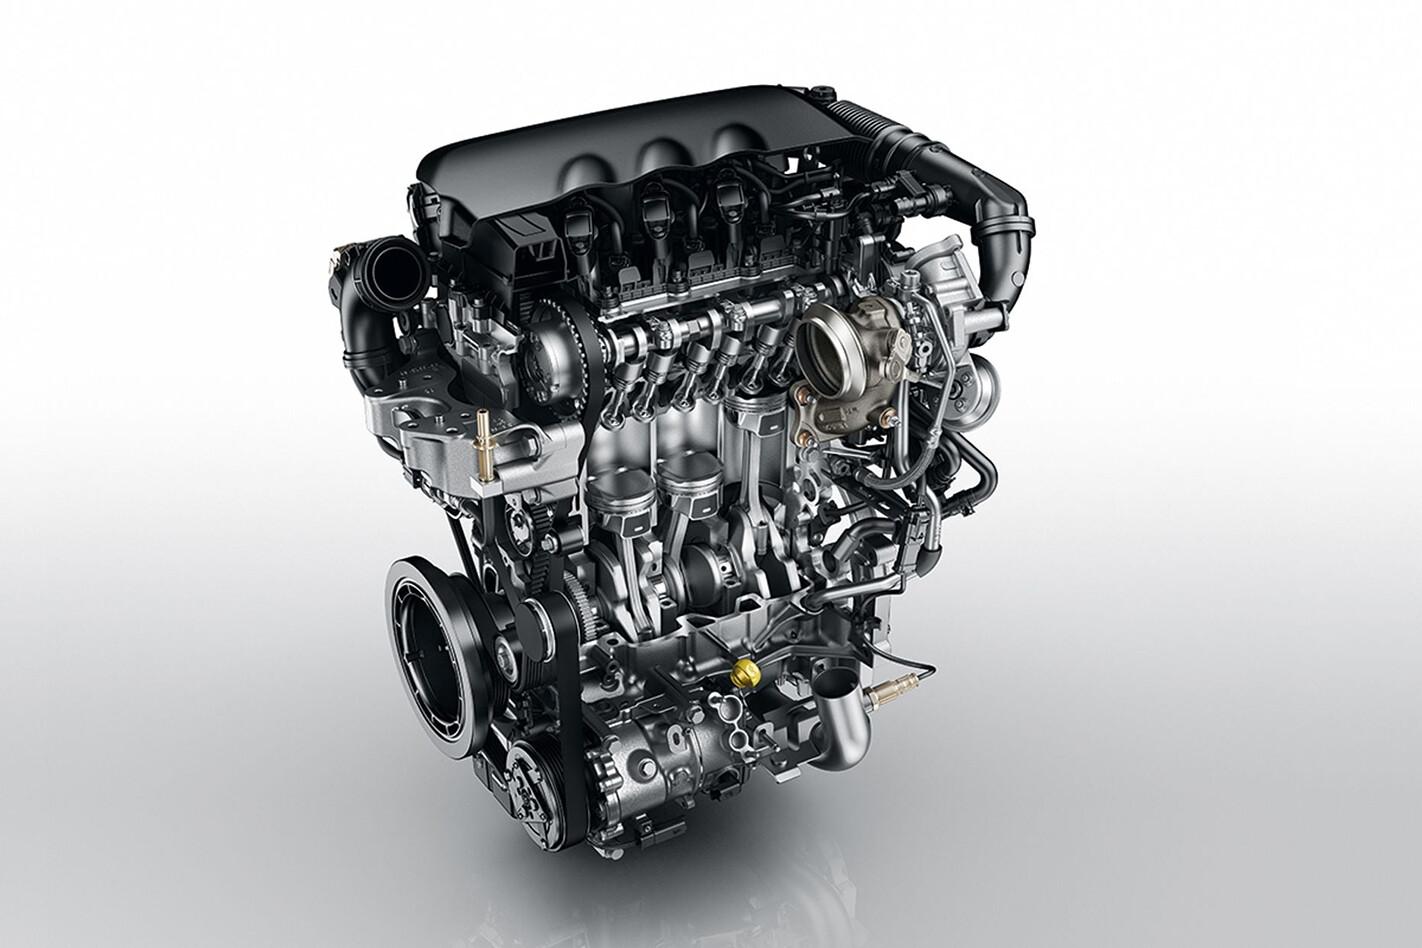 Peugeot 308 PureTech 1.2 turbo